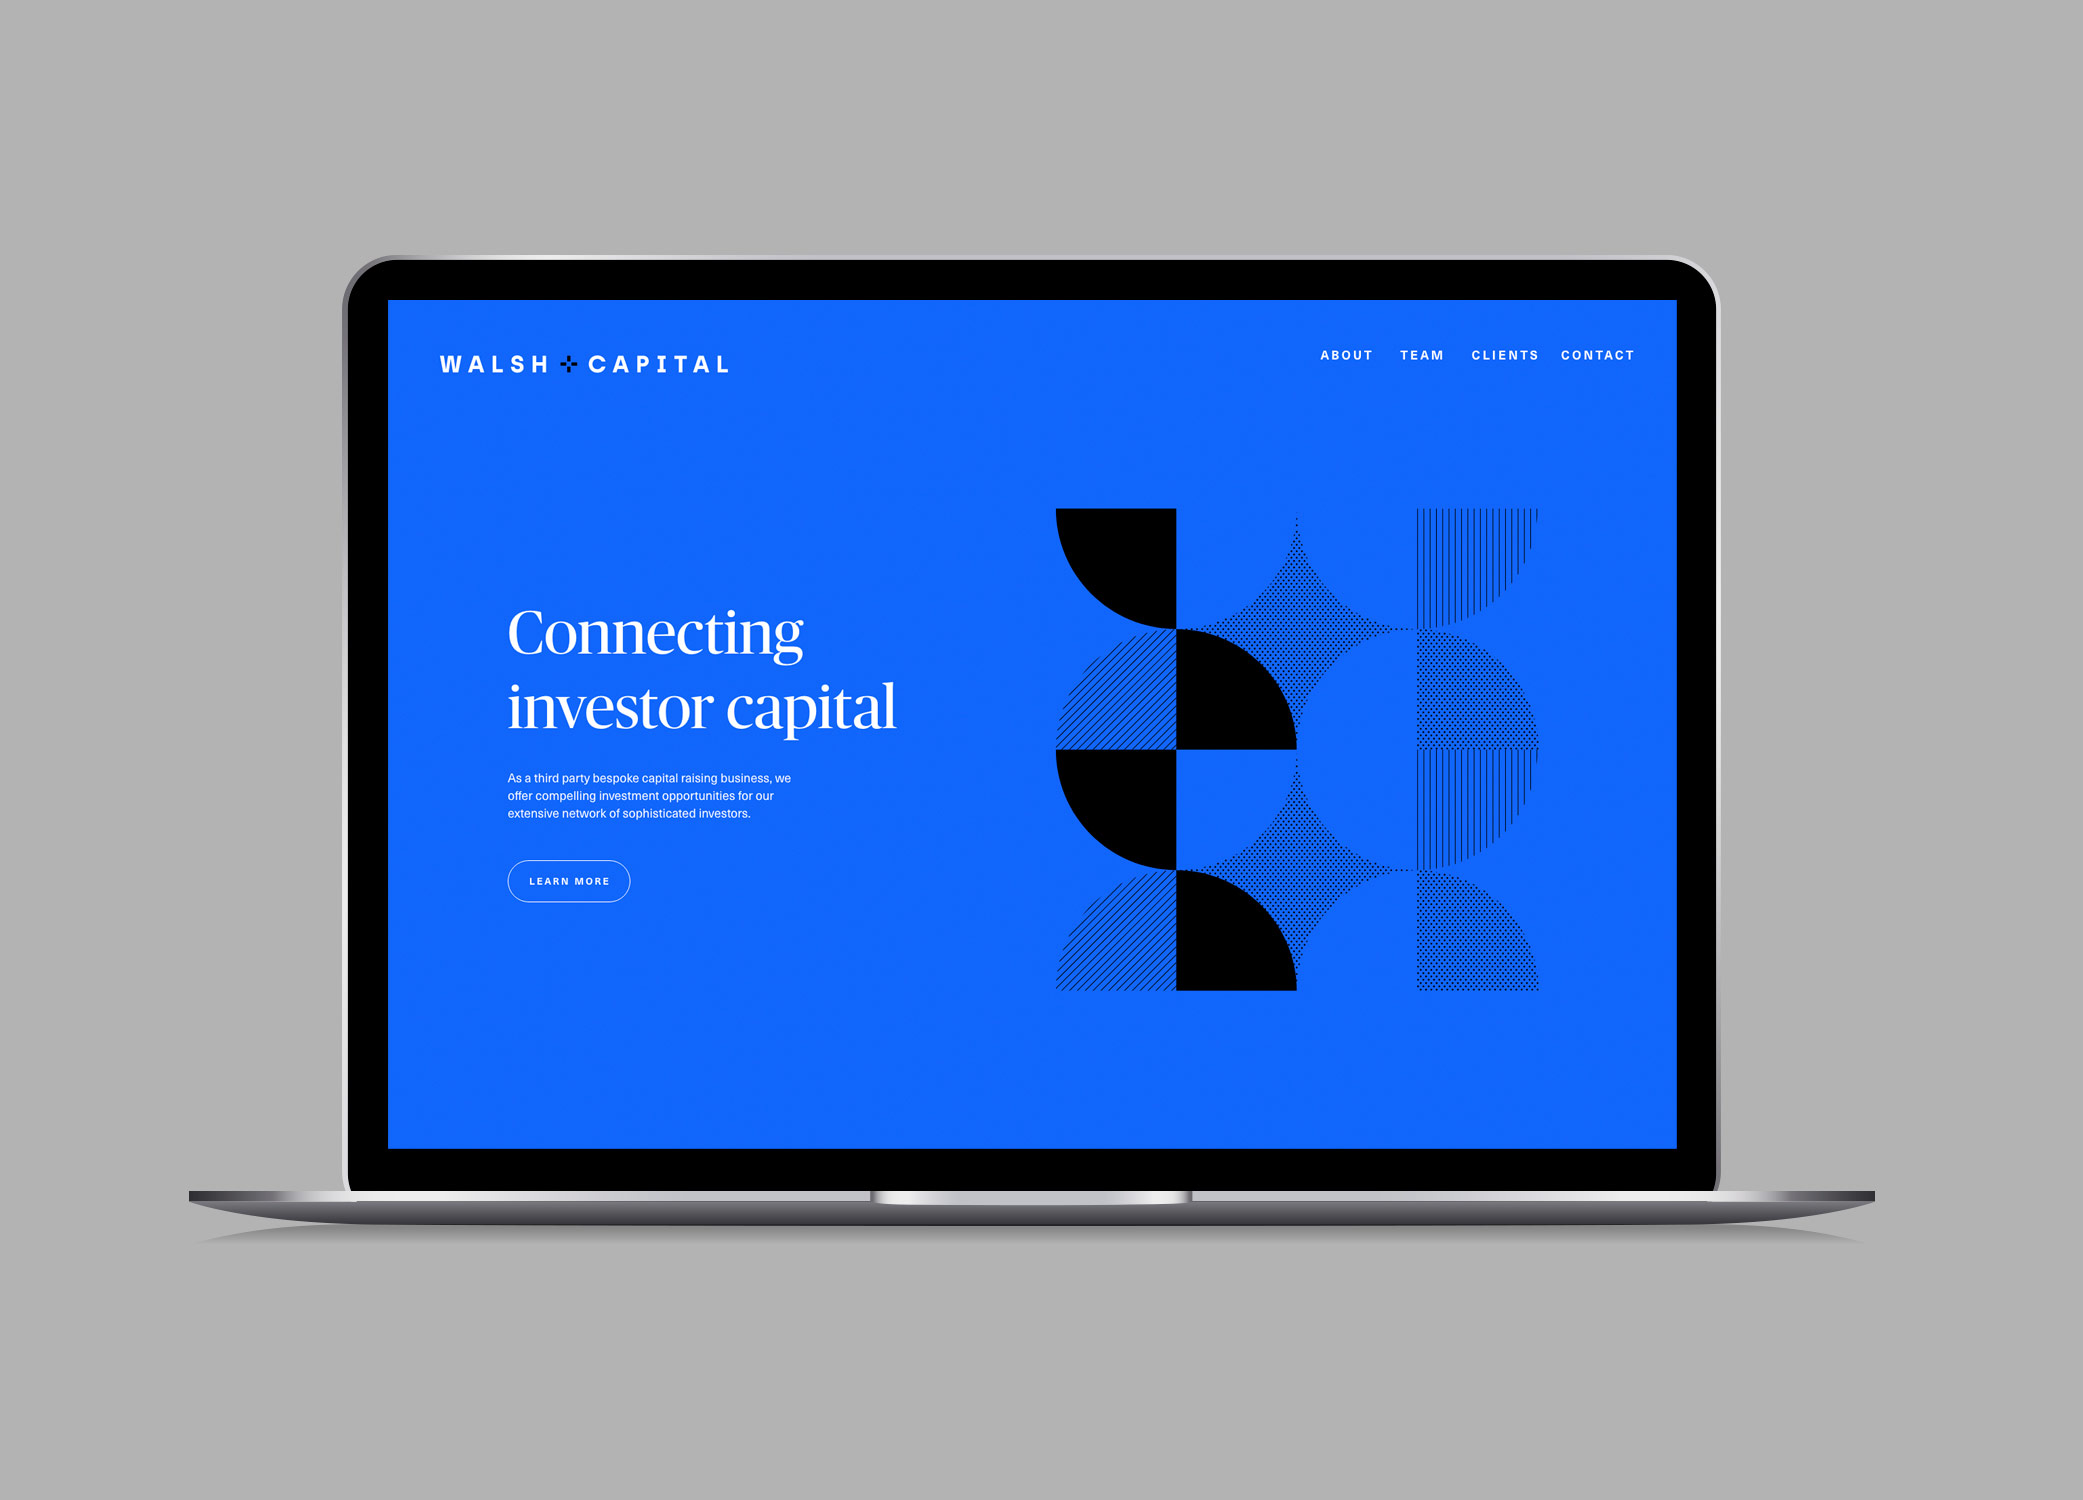 Walsh Capital